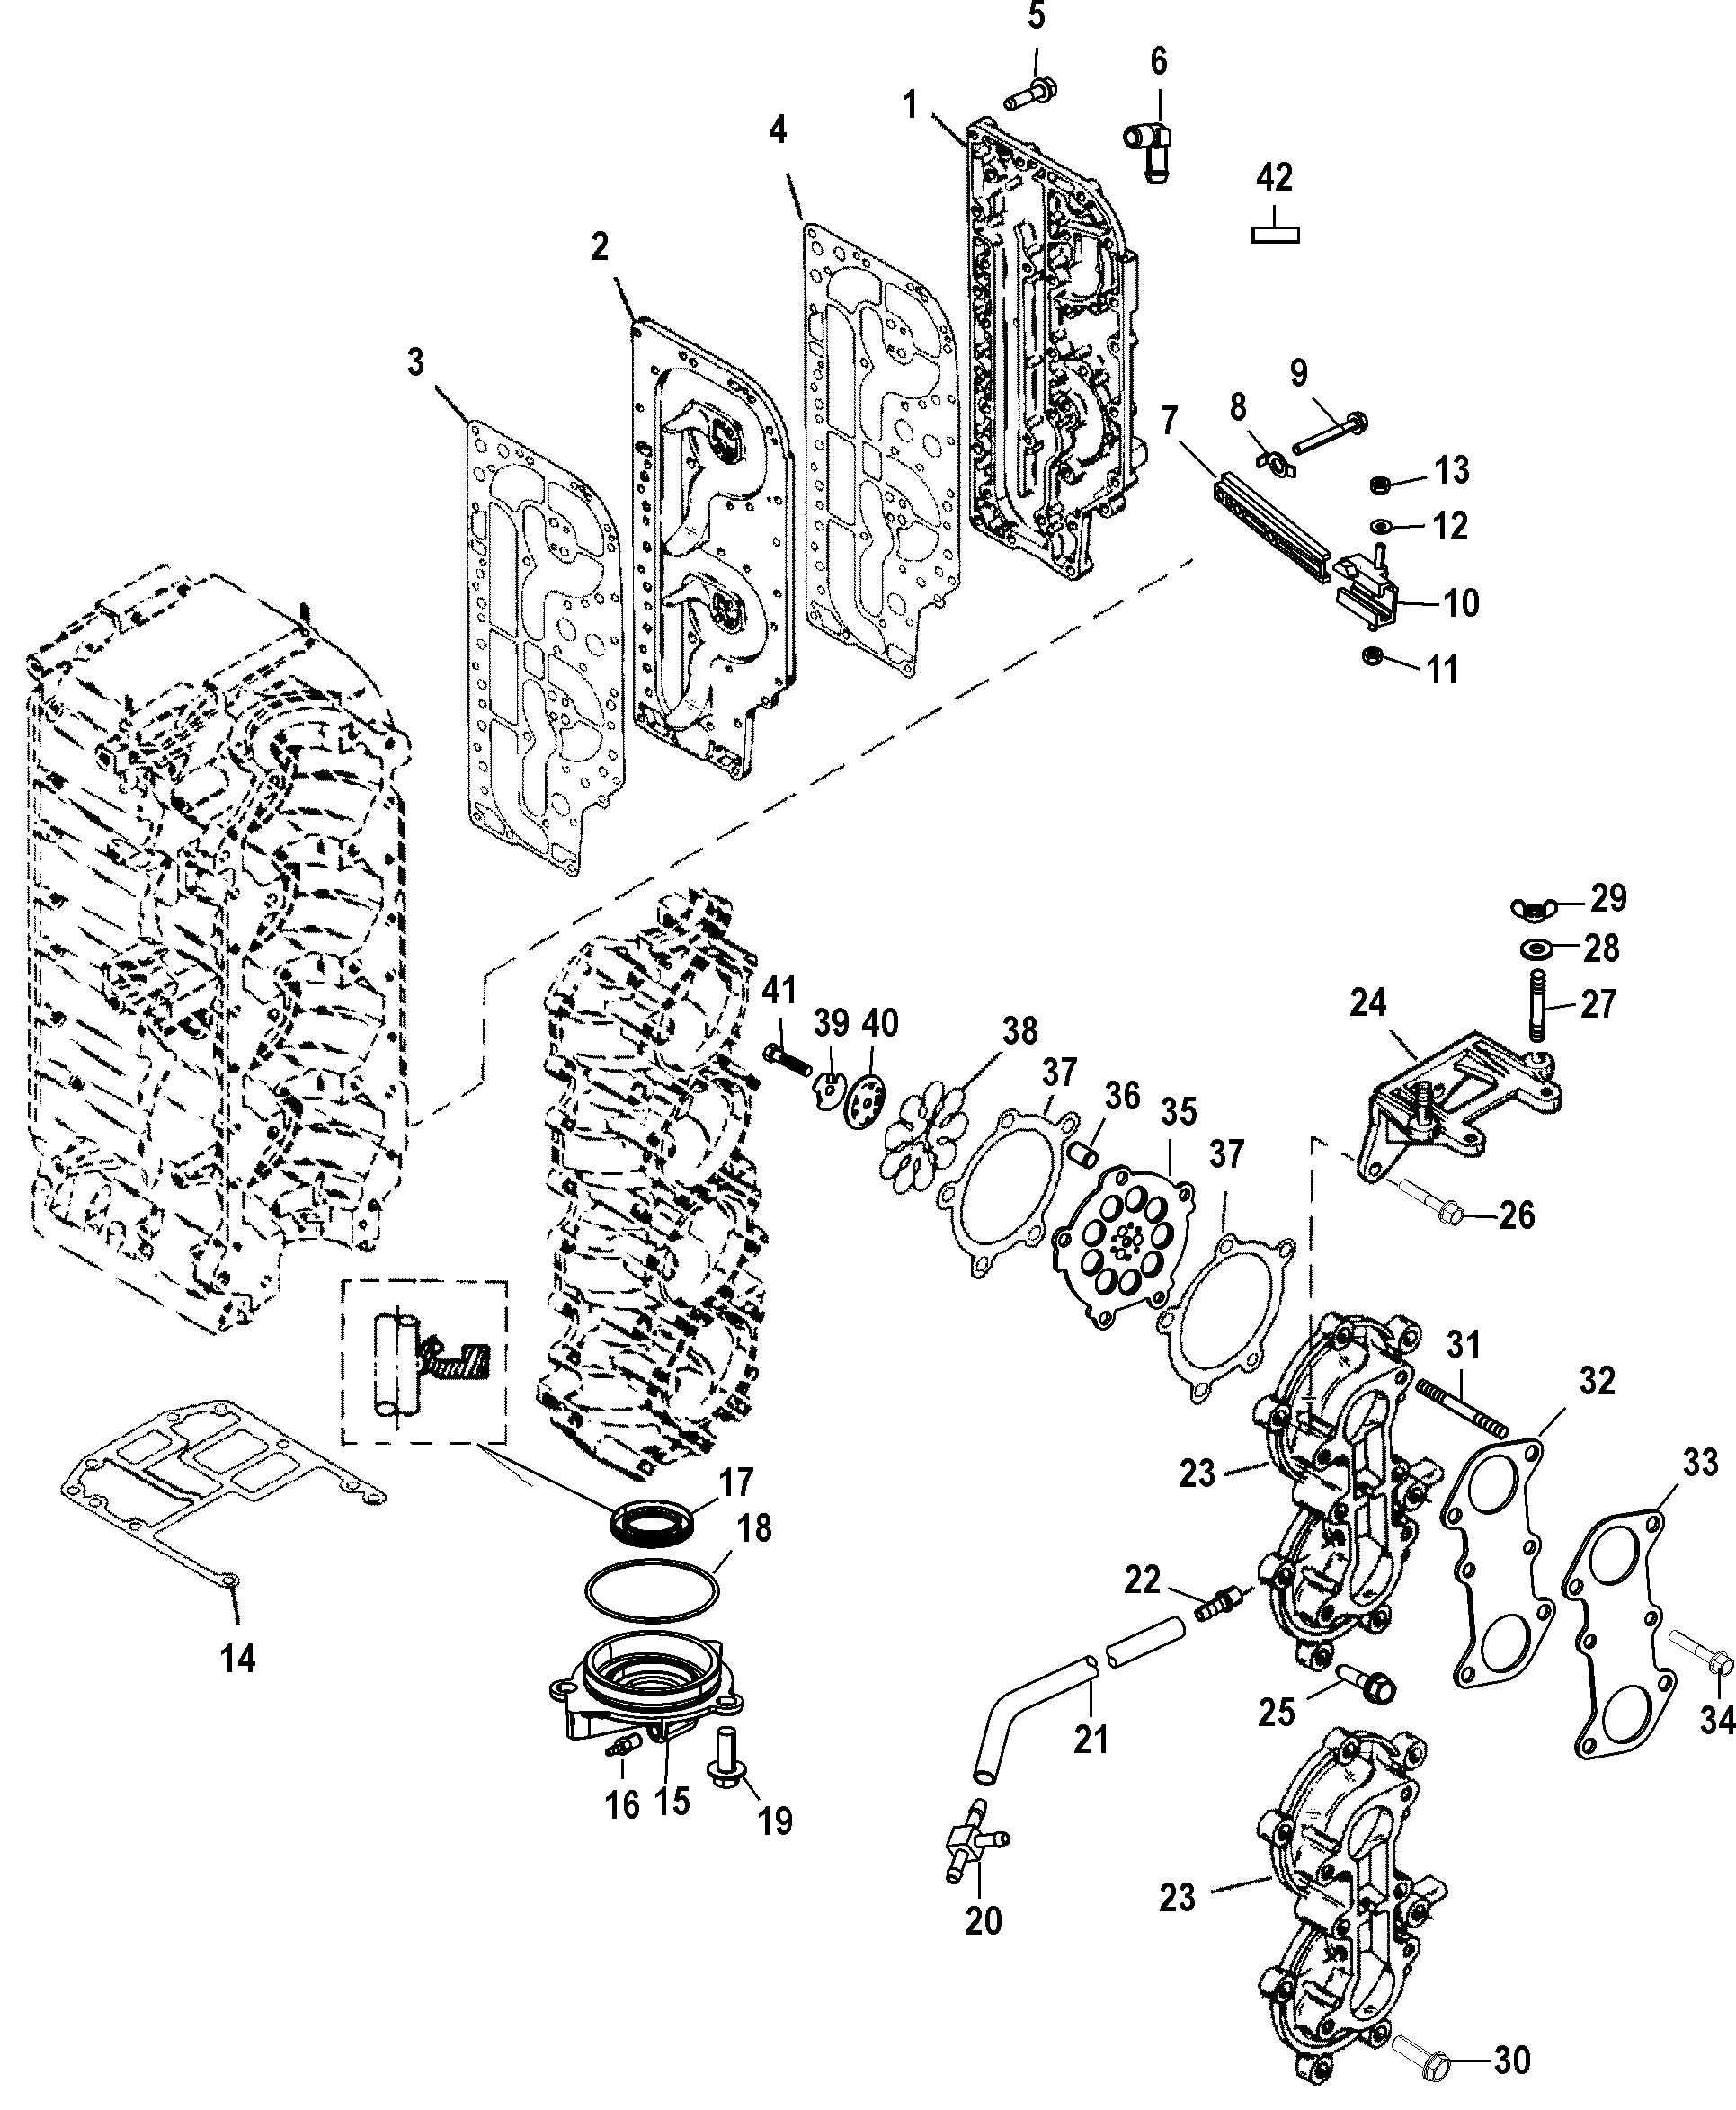 salt water engine diagram i have a 115 mercury saltwater series, 2004 i think, is ... tailgate salt spreader wiring diagram